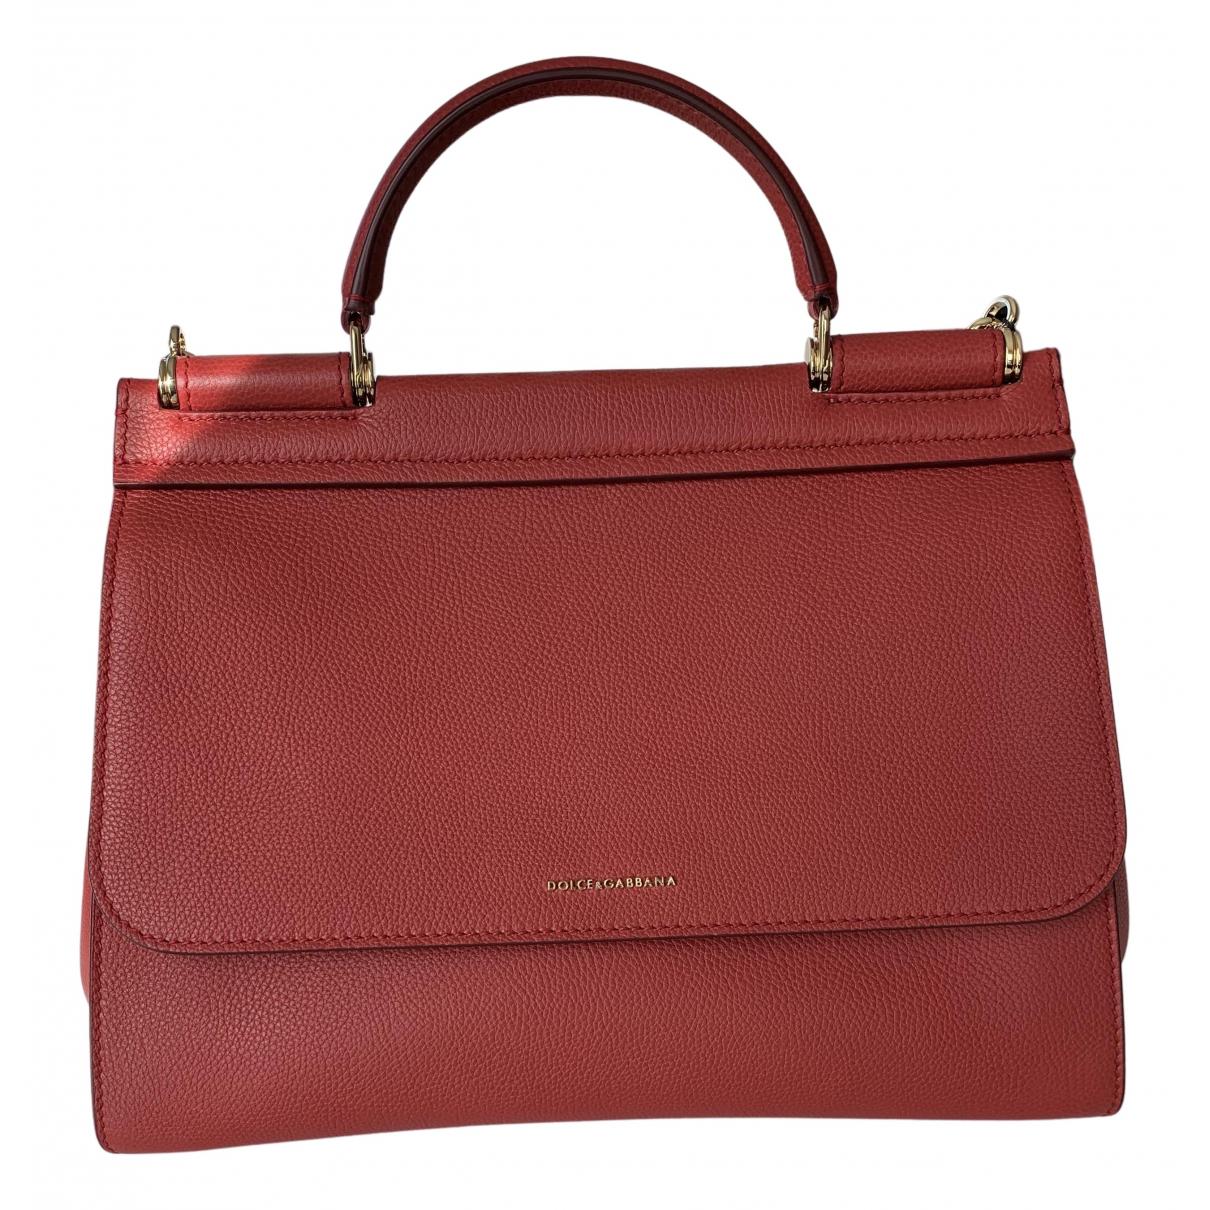 Dolce & Gabbana Sicily Red Leather handbag for Women N